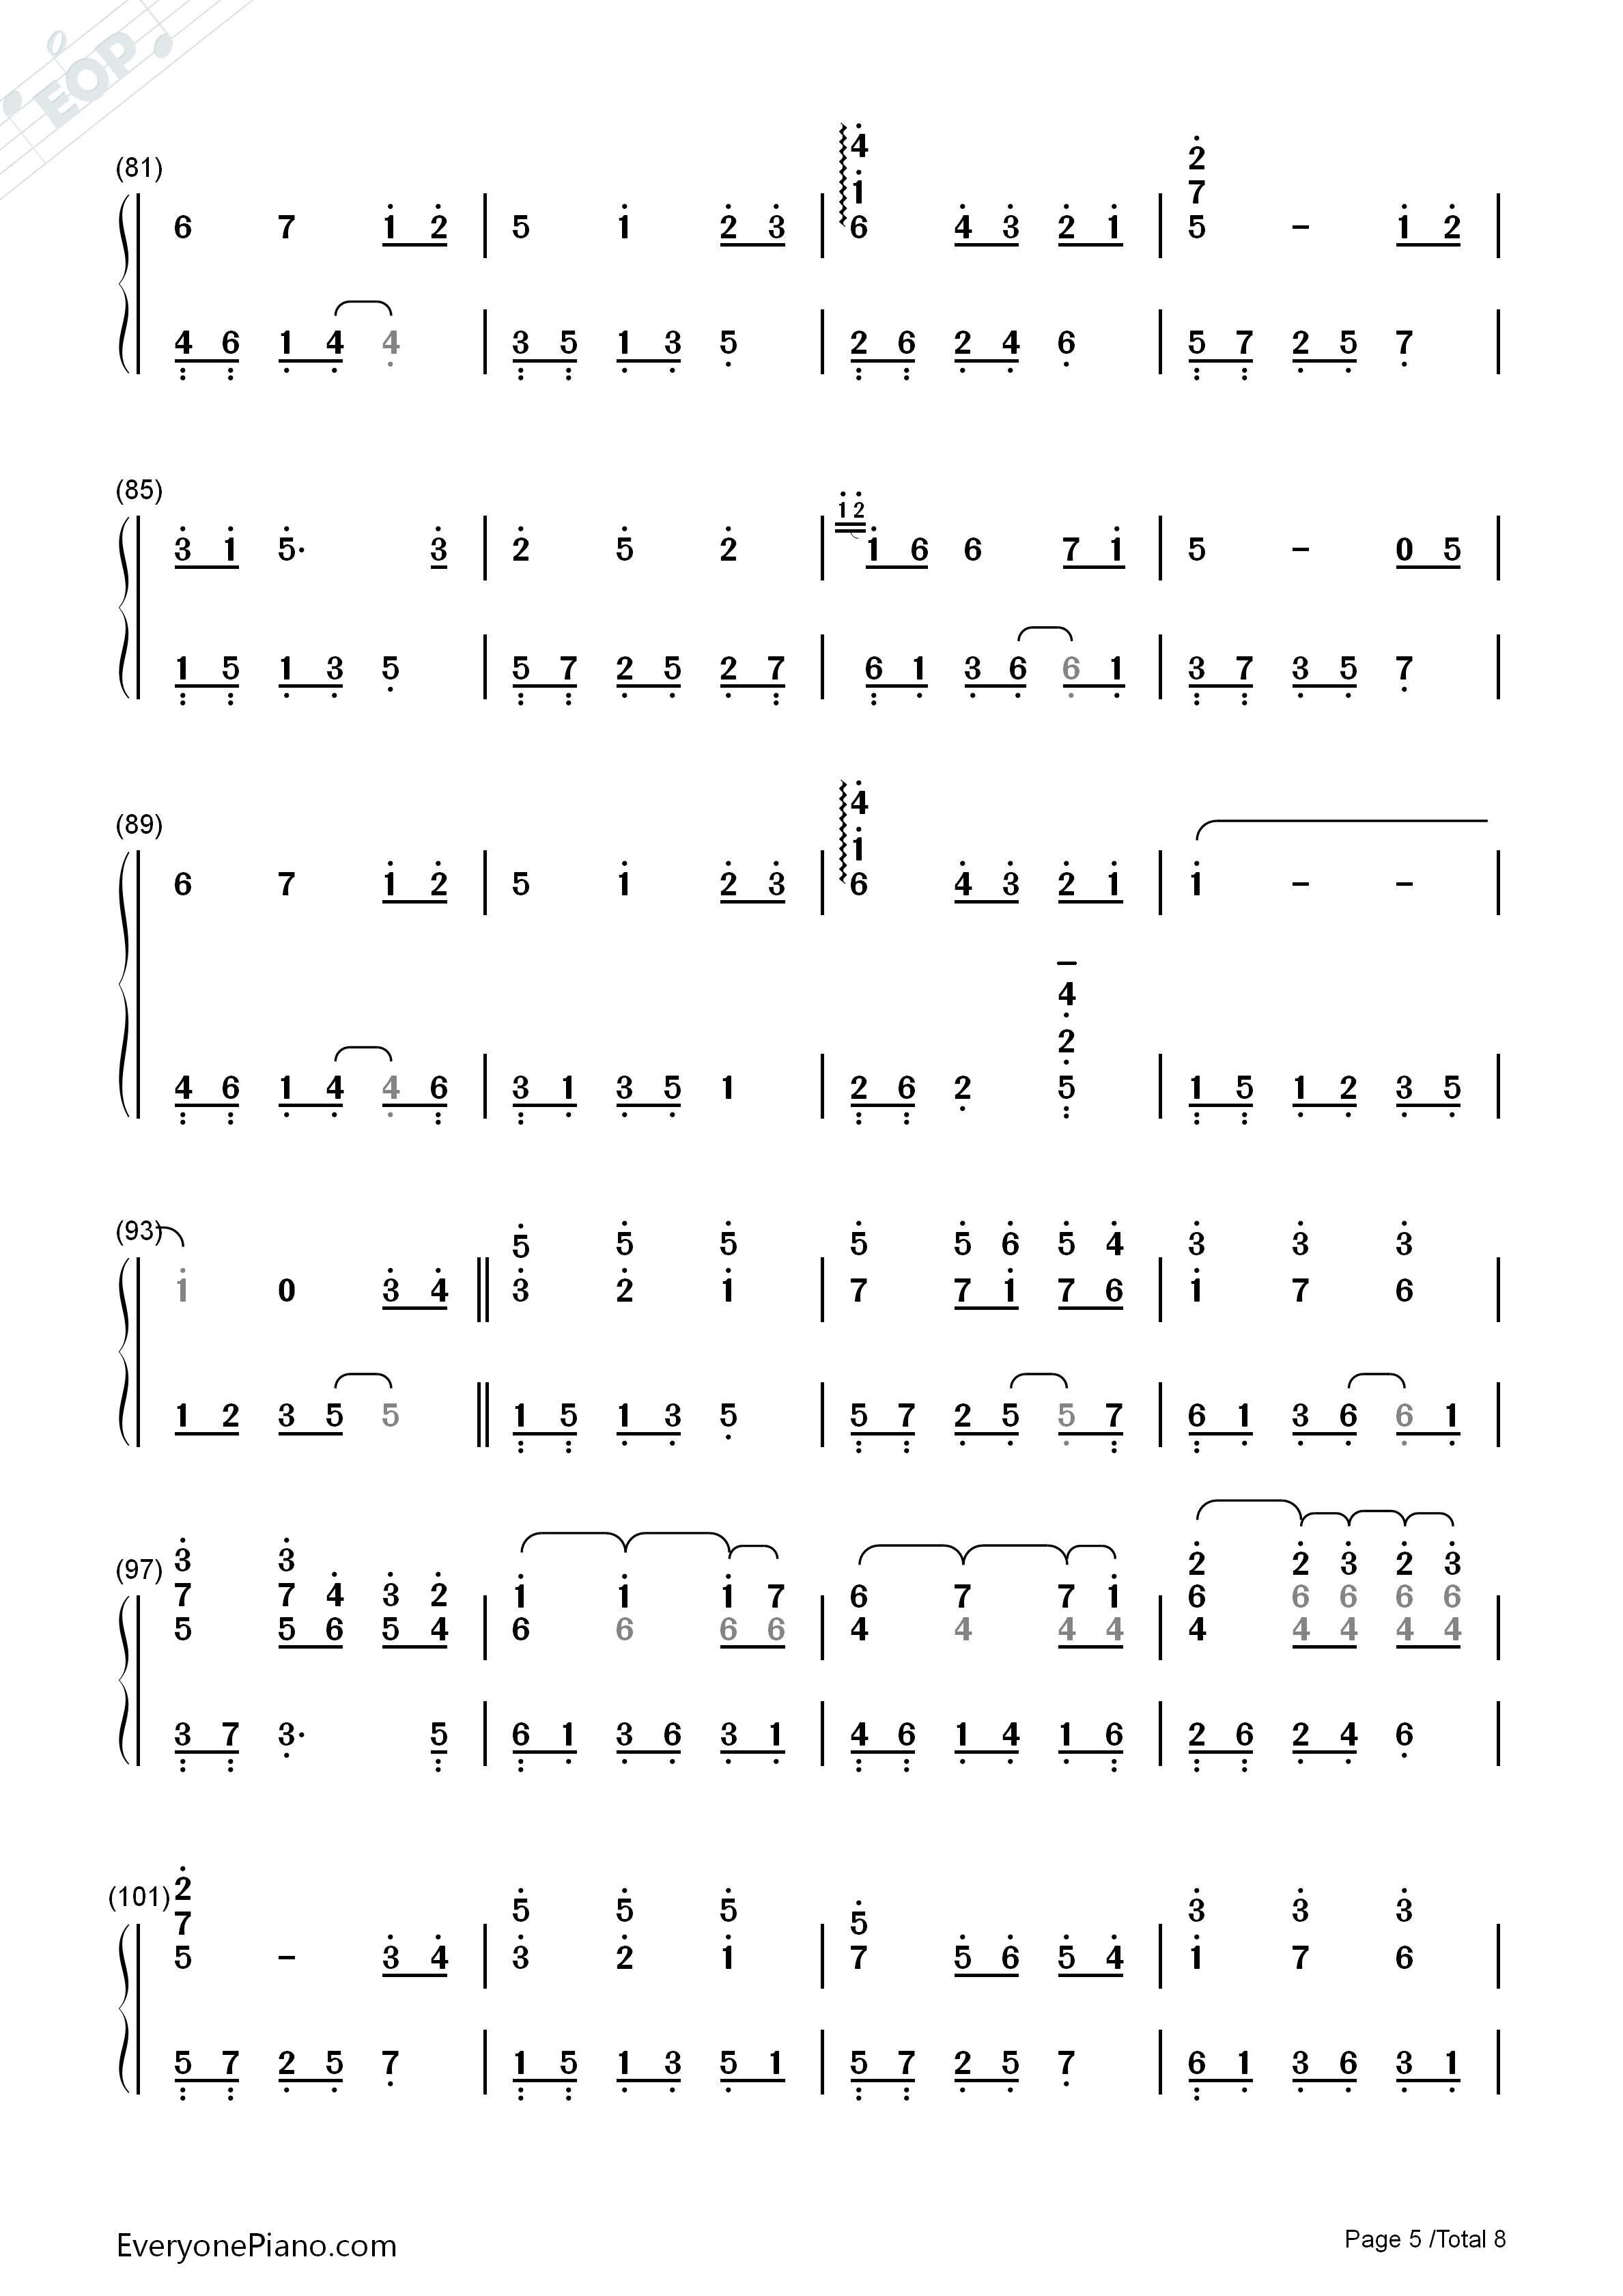 Always with Me 千与千寻片尾曲双手简谱预览5 钢琴谱文件 五线谱 双手